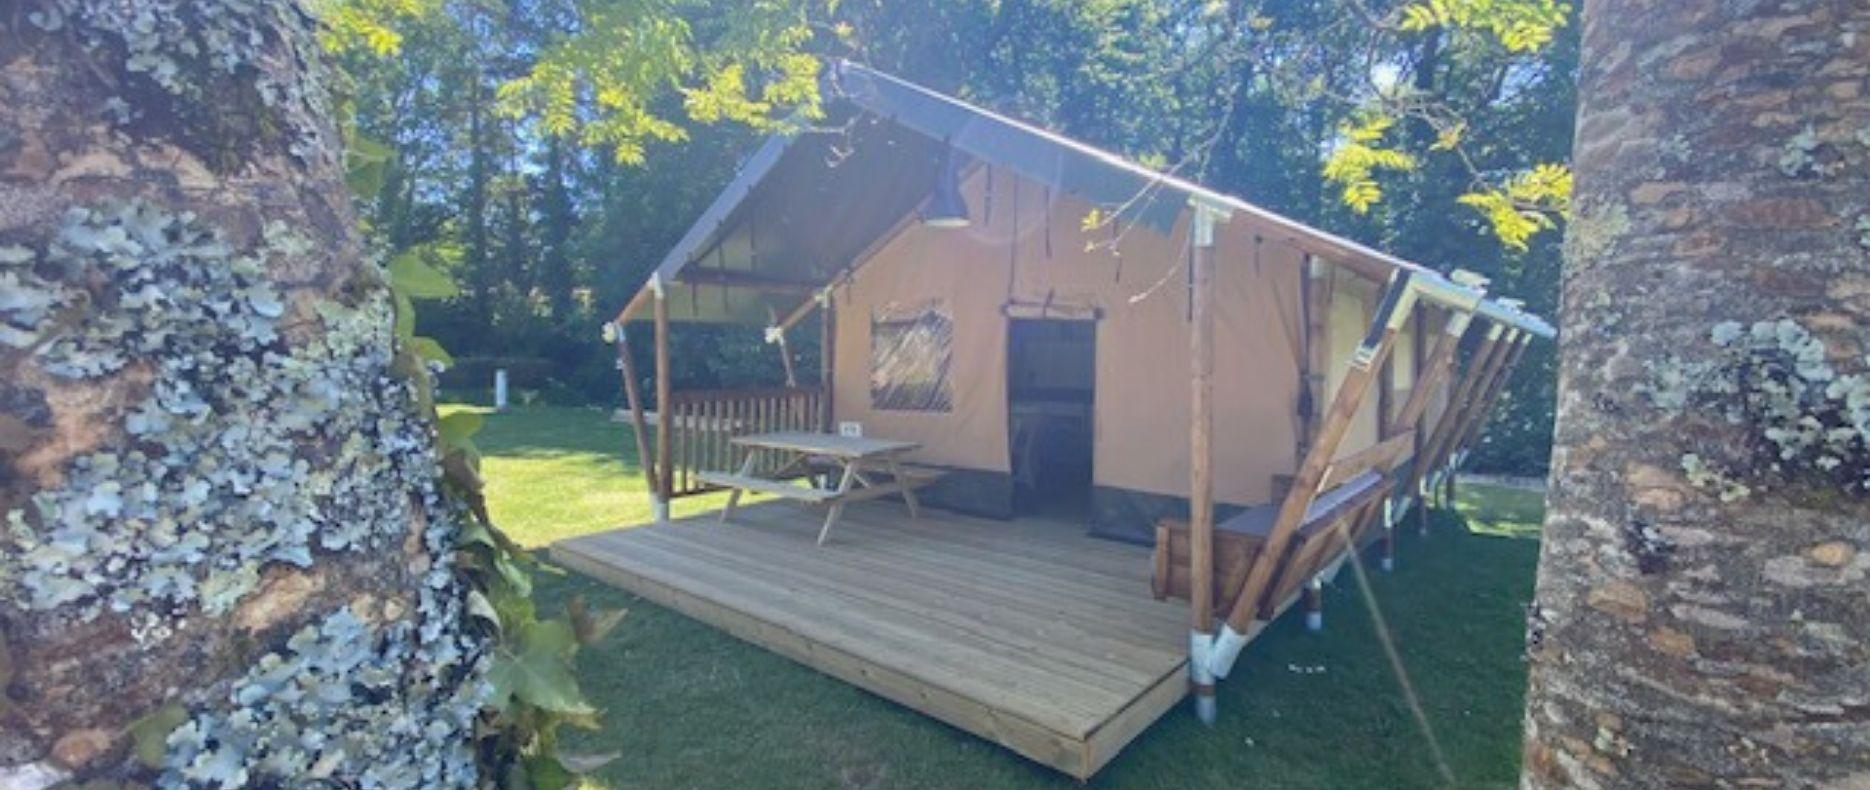 Camping Du Quinquis : Camping Du Quinquis Tente Safari Wood Camping Clohars Carnoet (2)